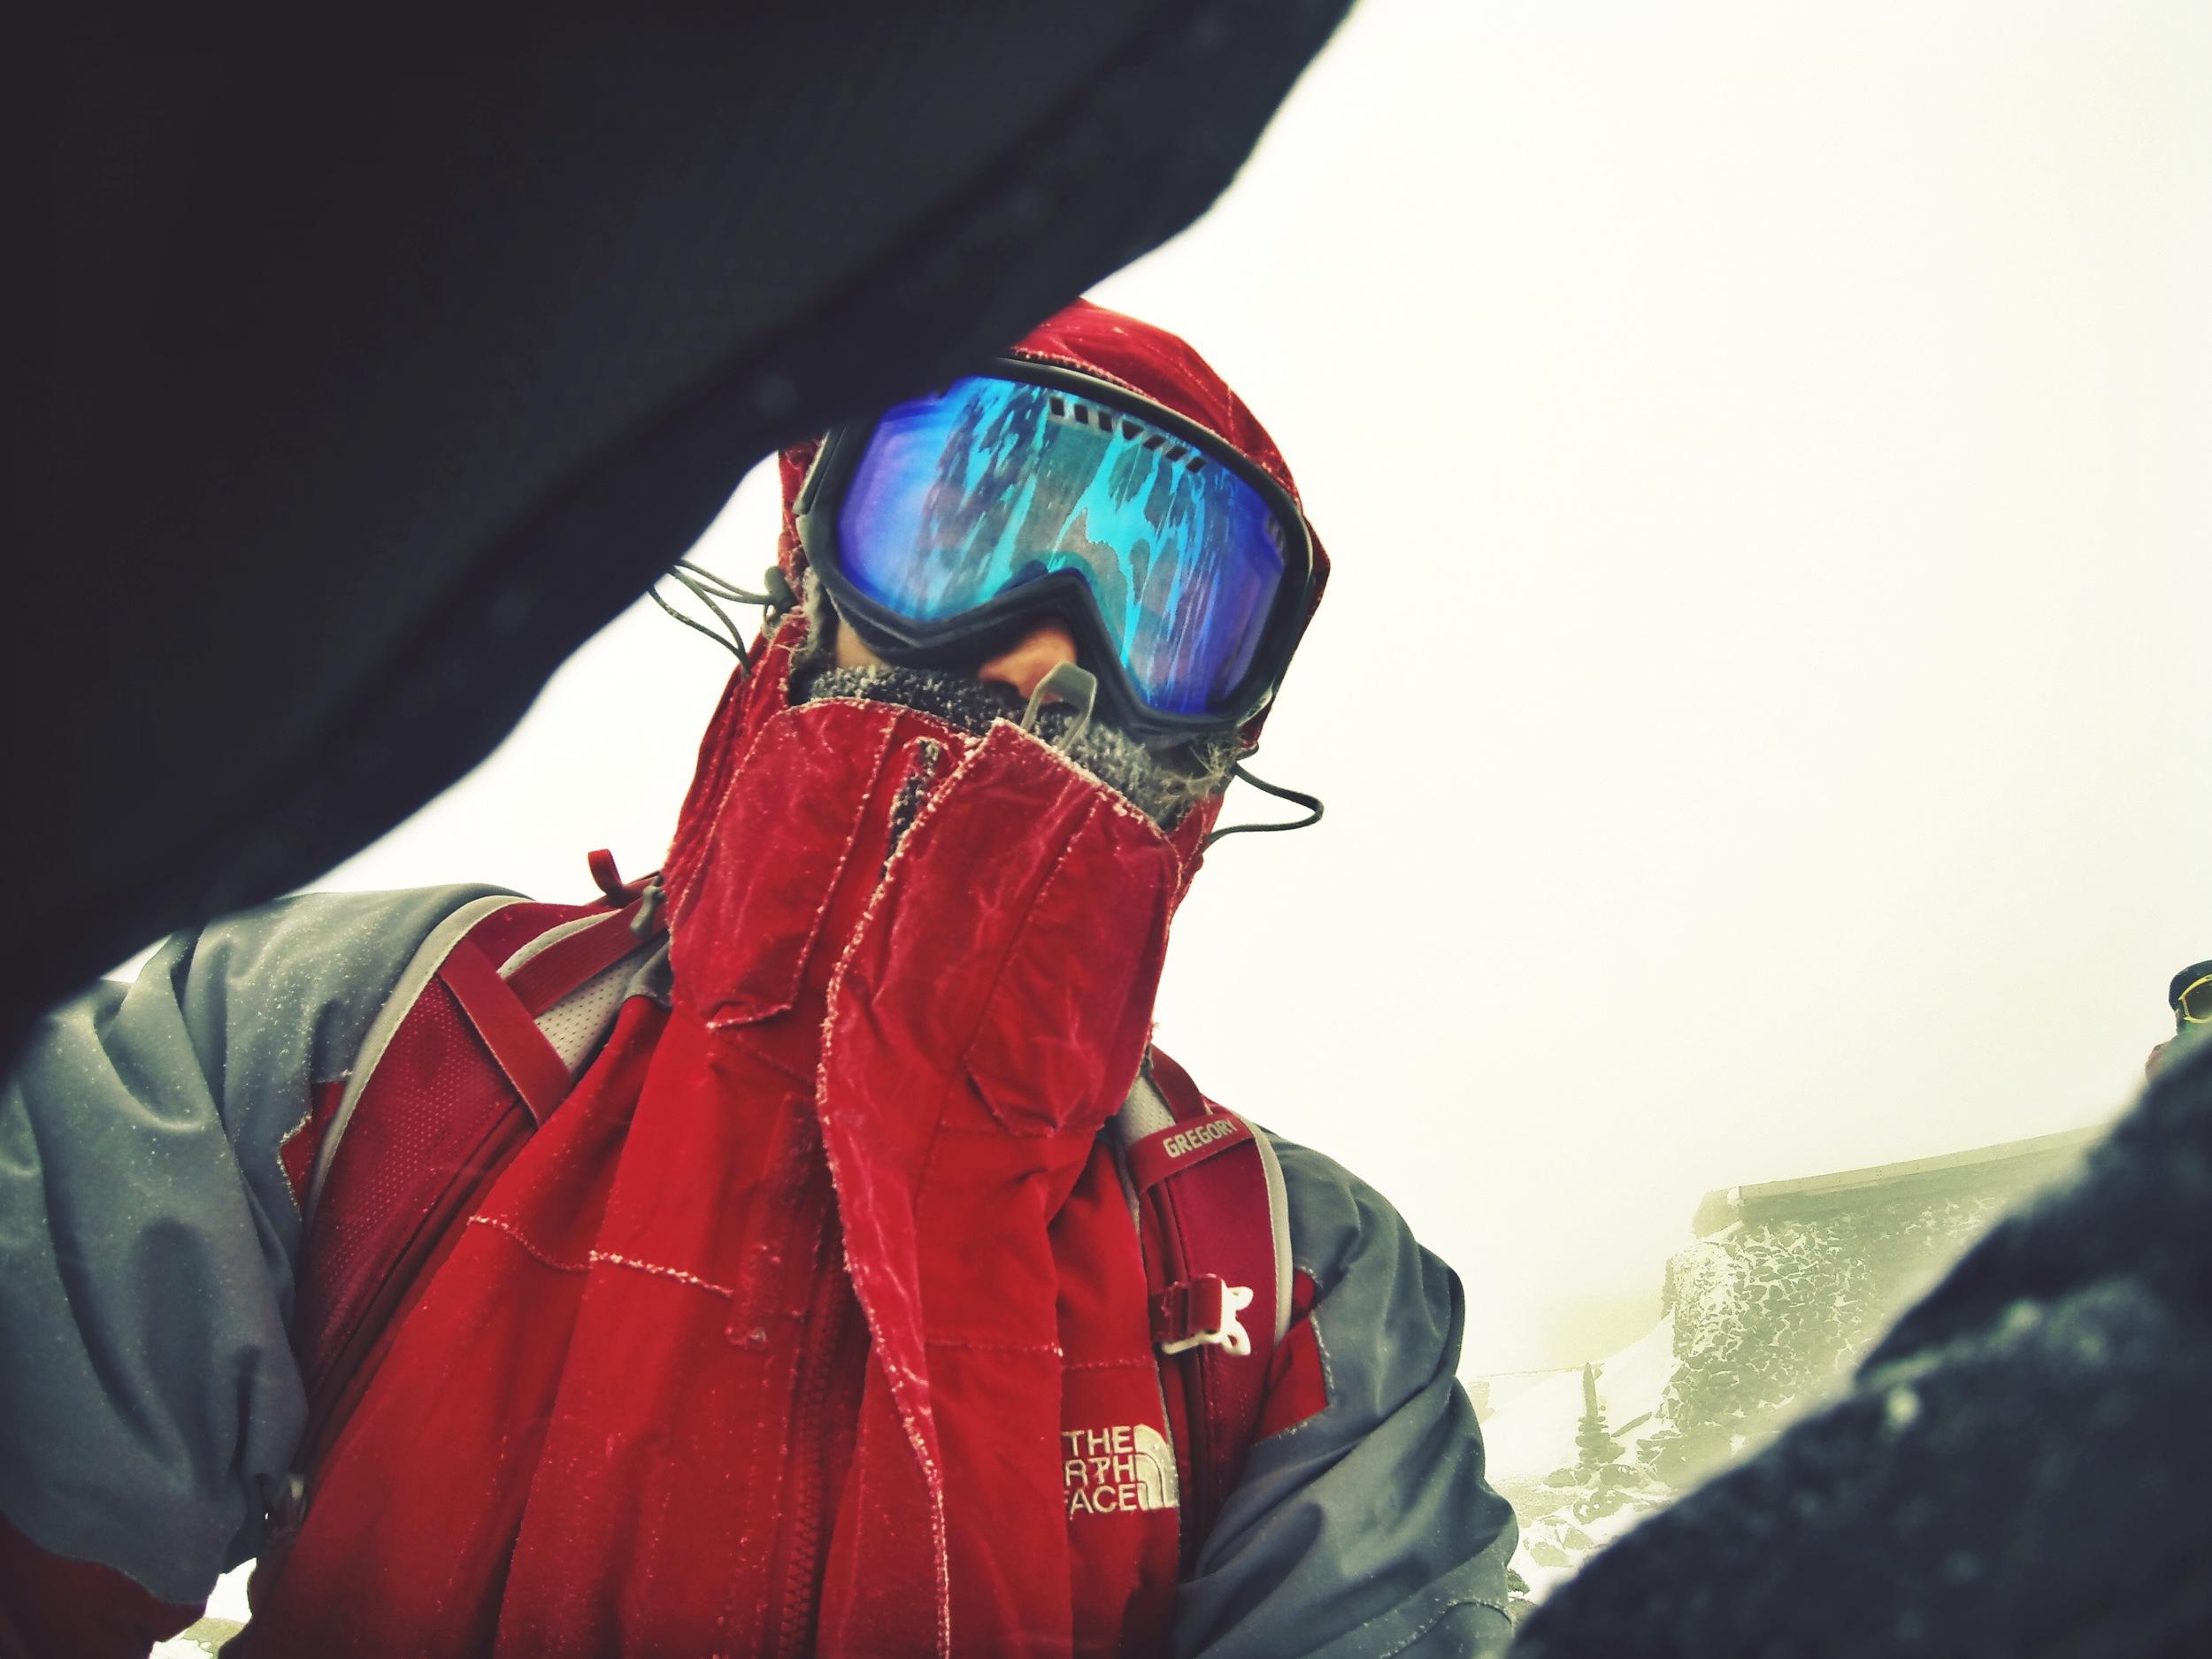 Alpine at the summit.